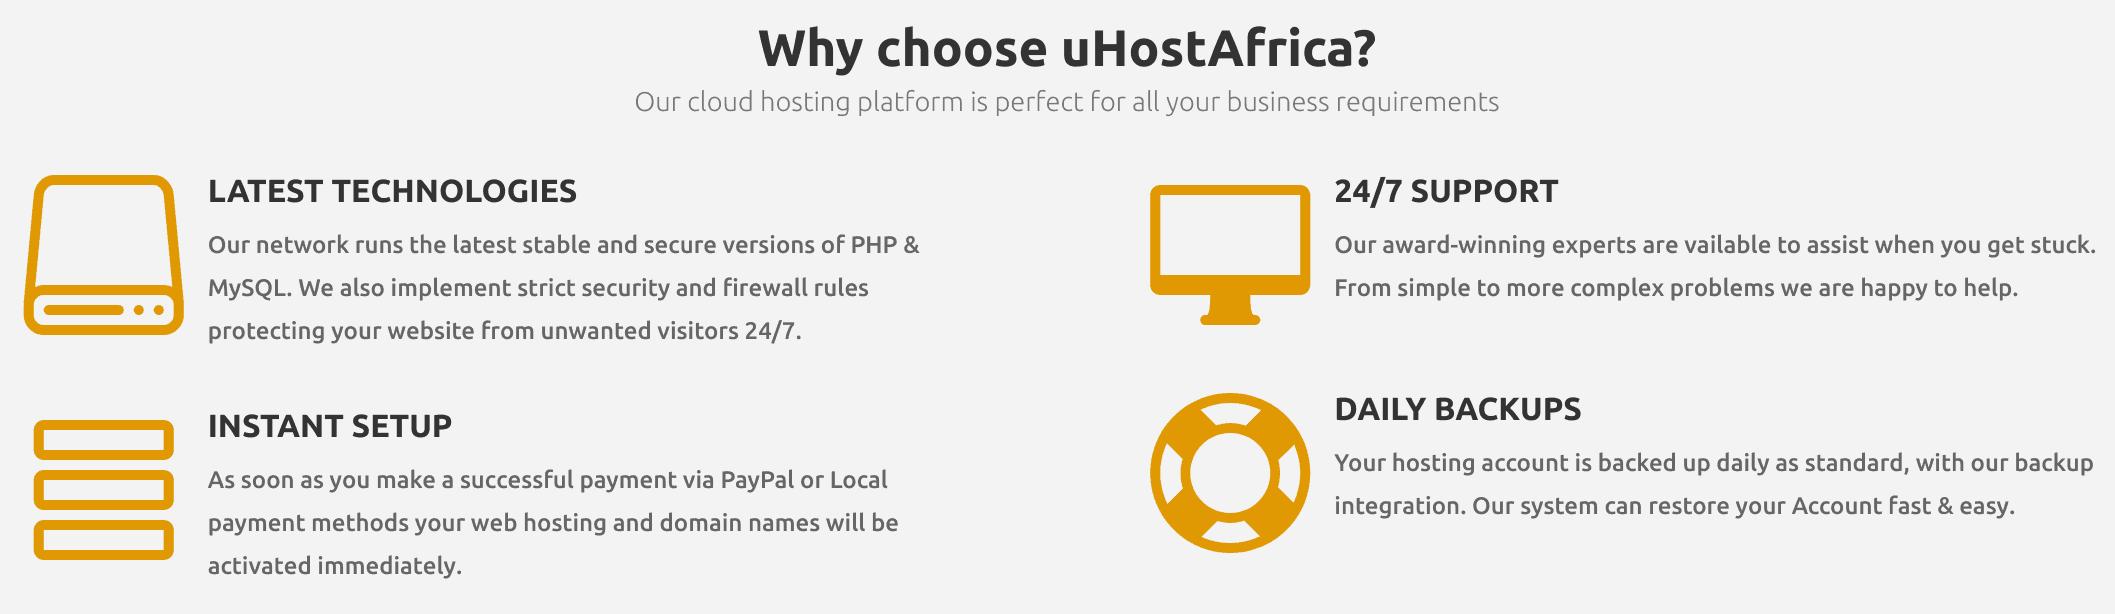 uHostAfrica